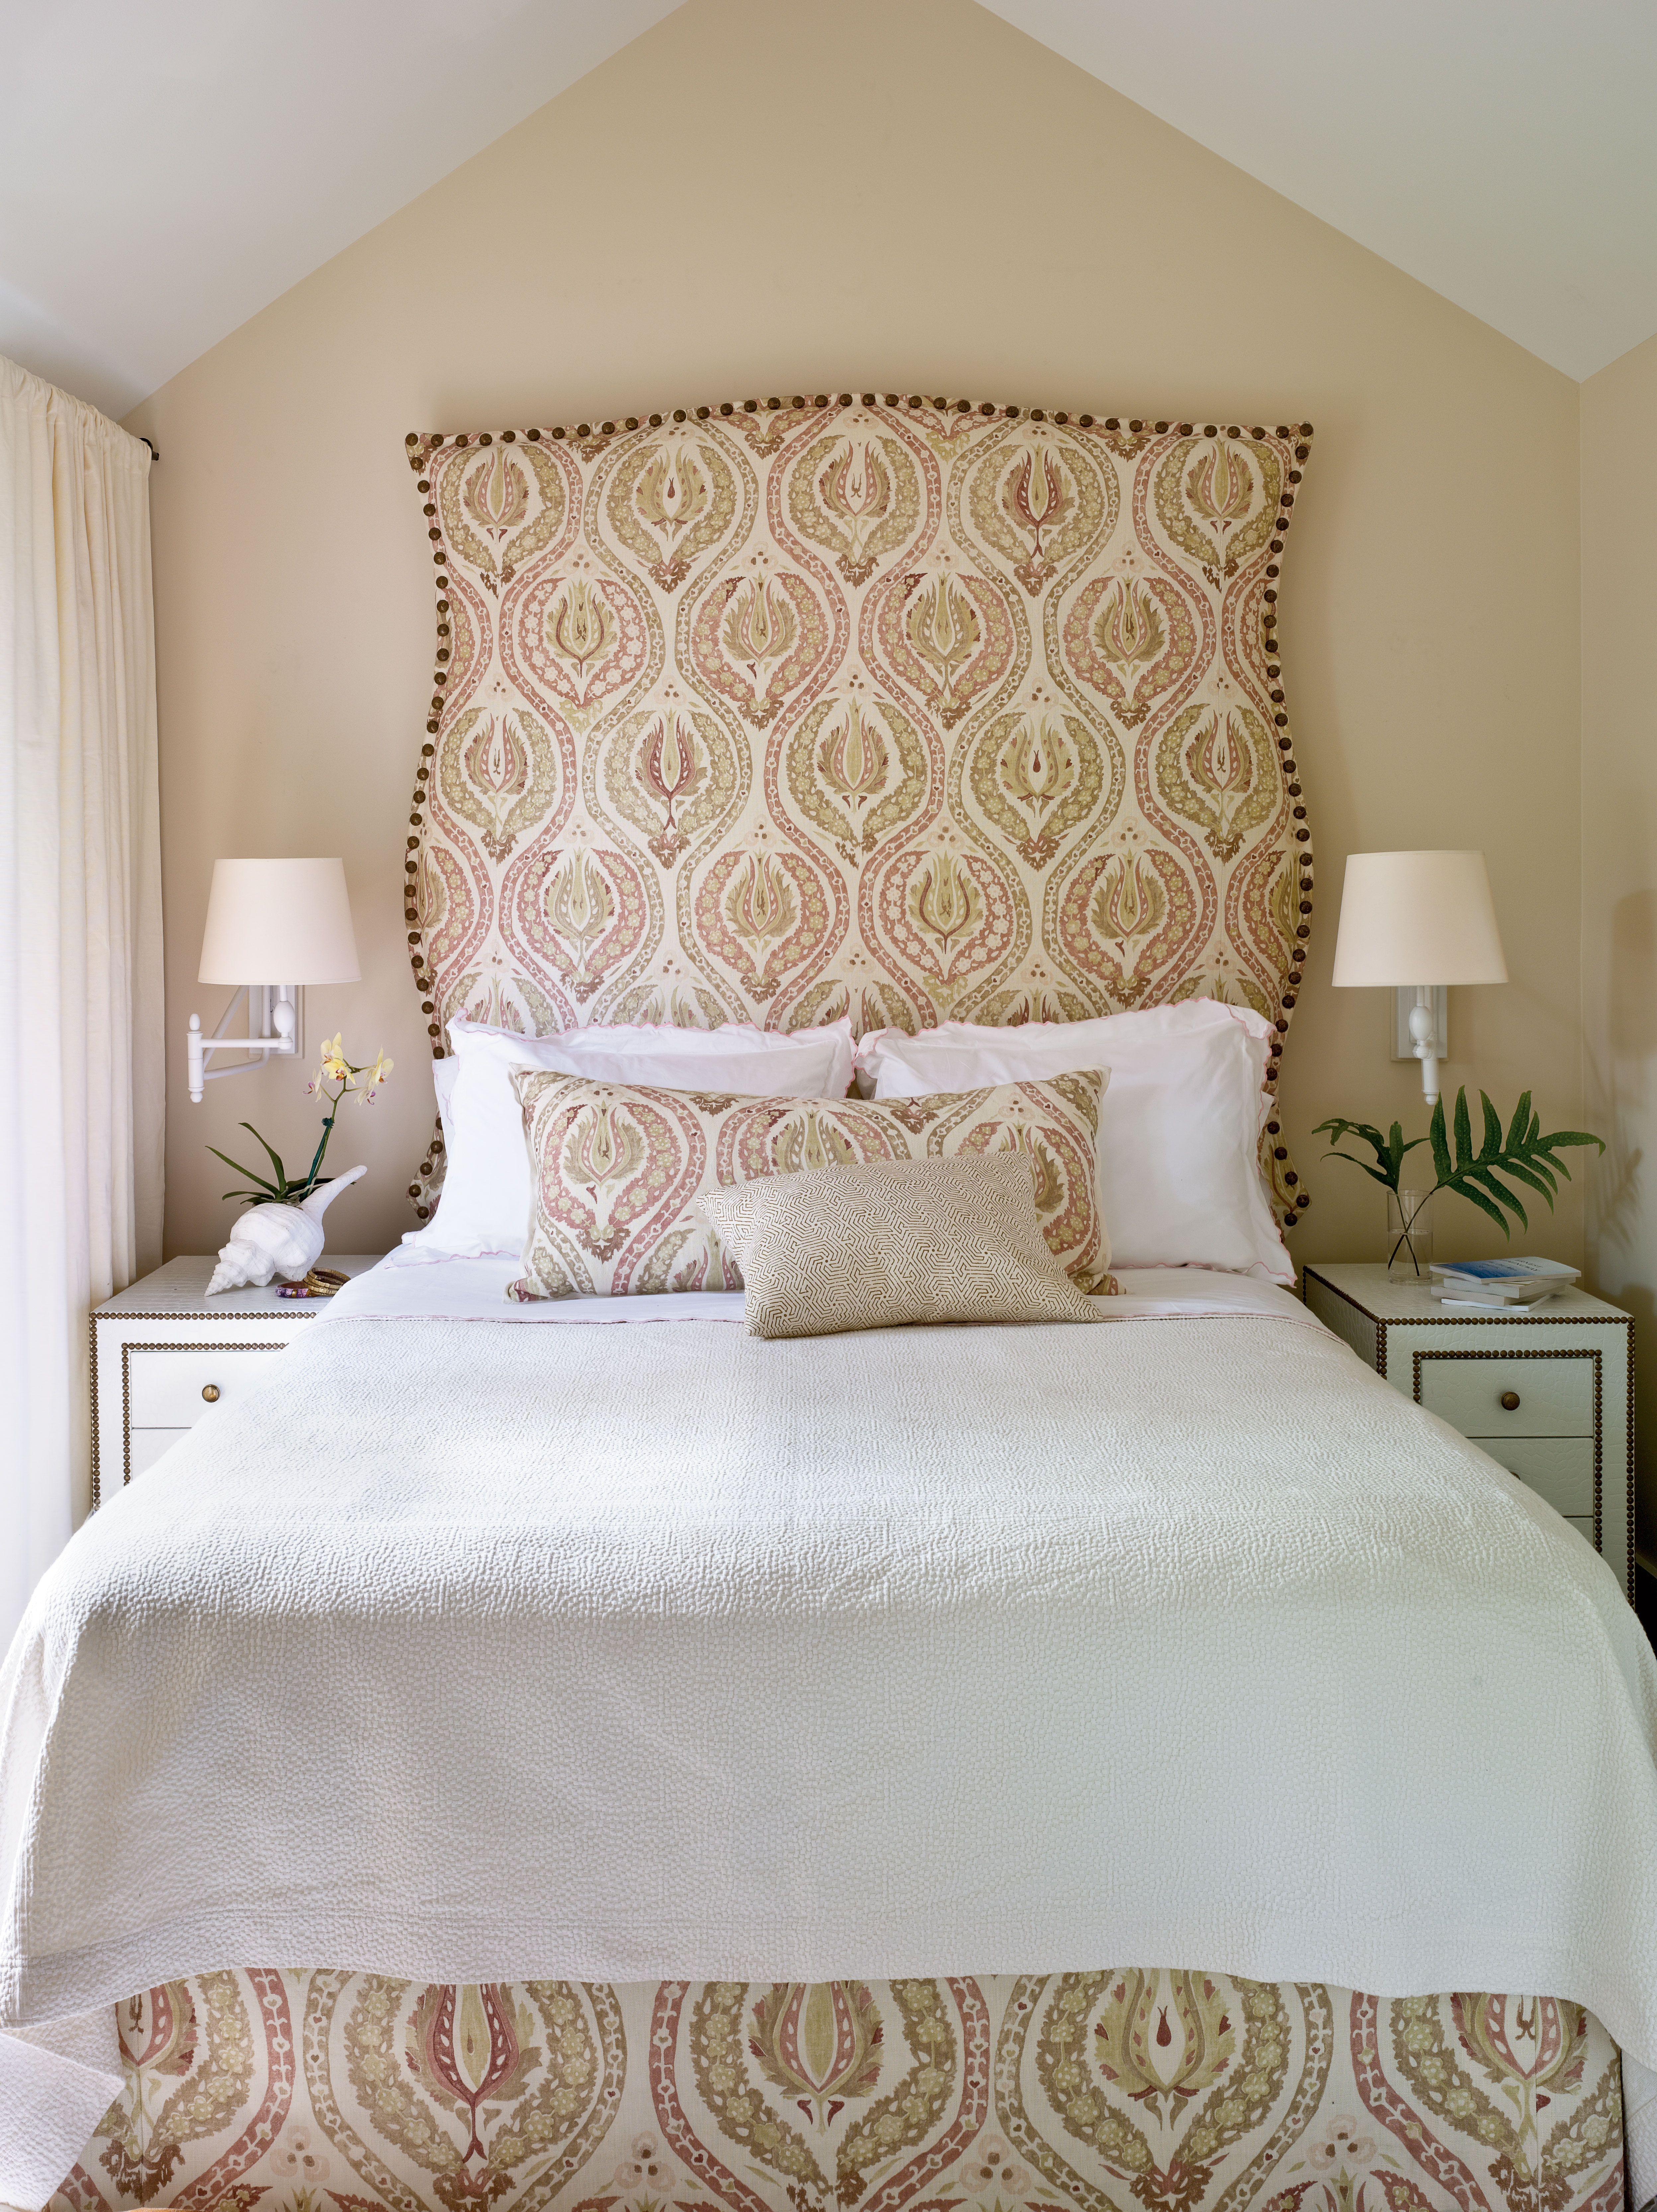 Master bedroom upholstered headboard key west style pinterest